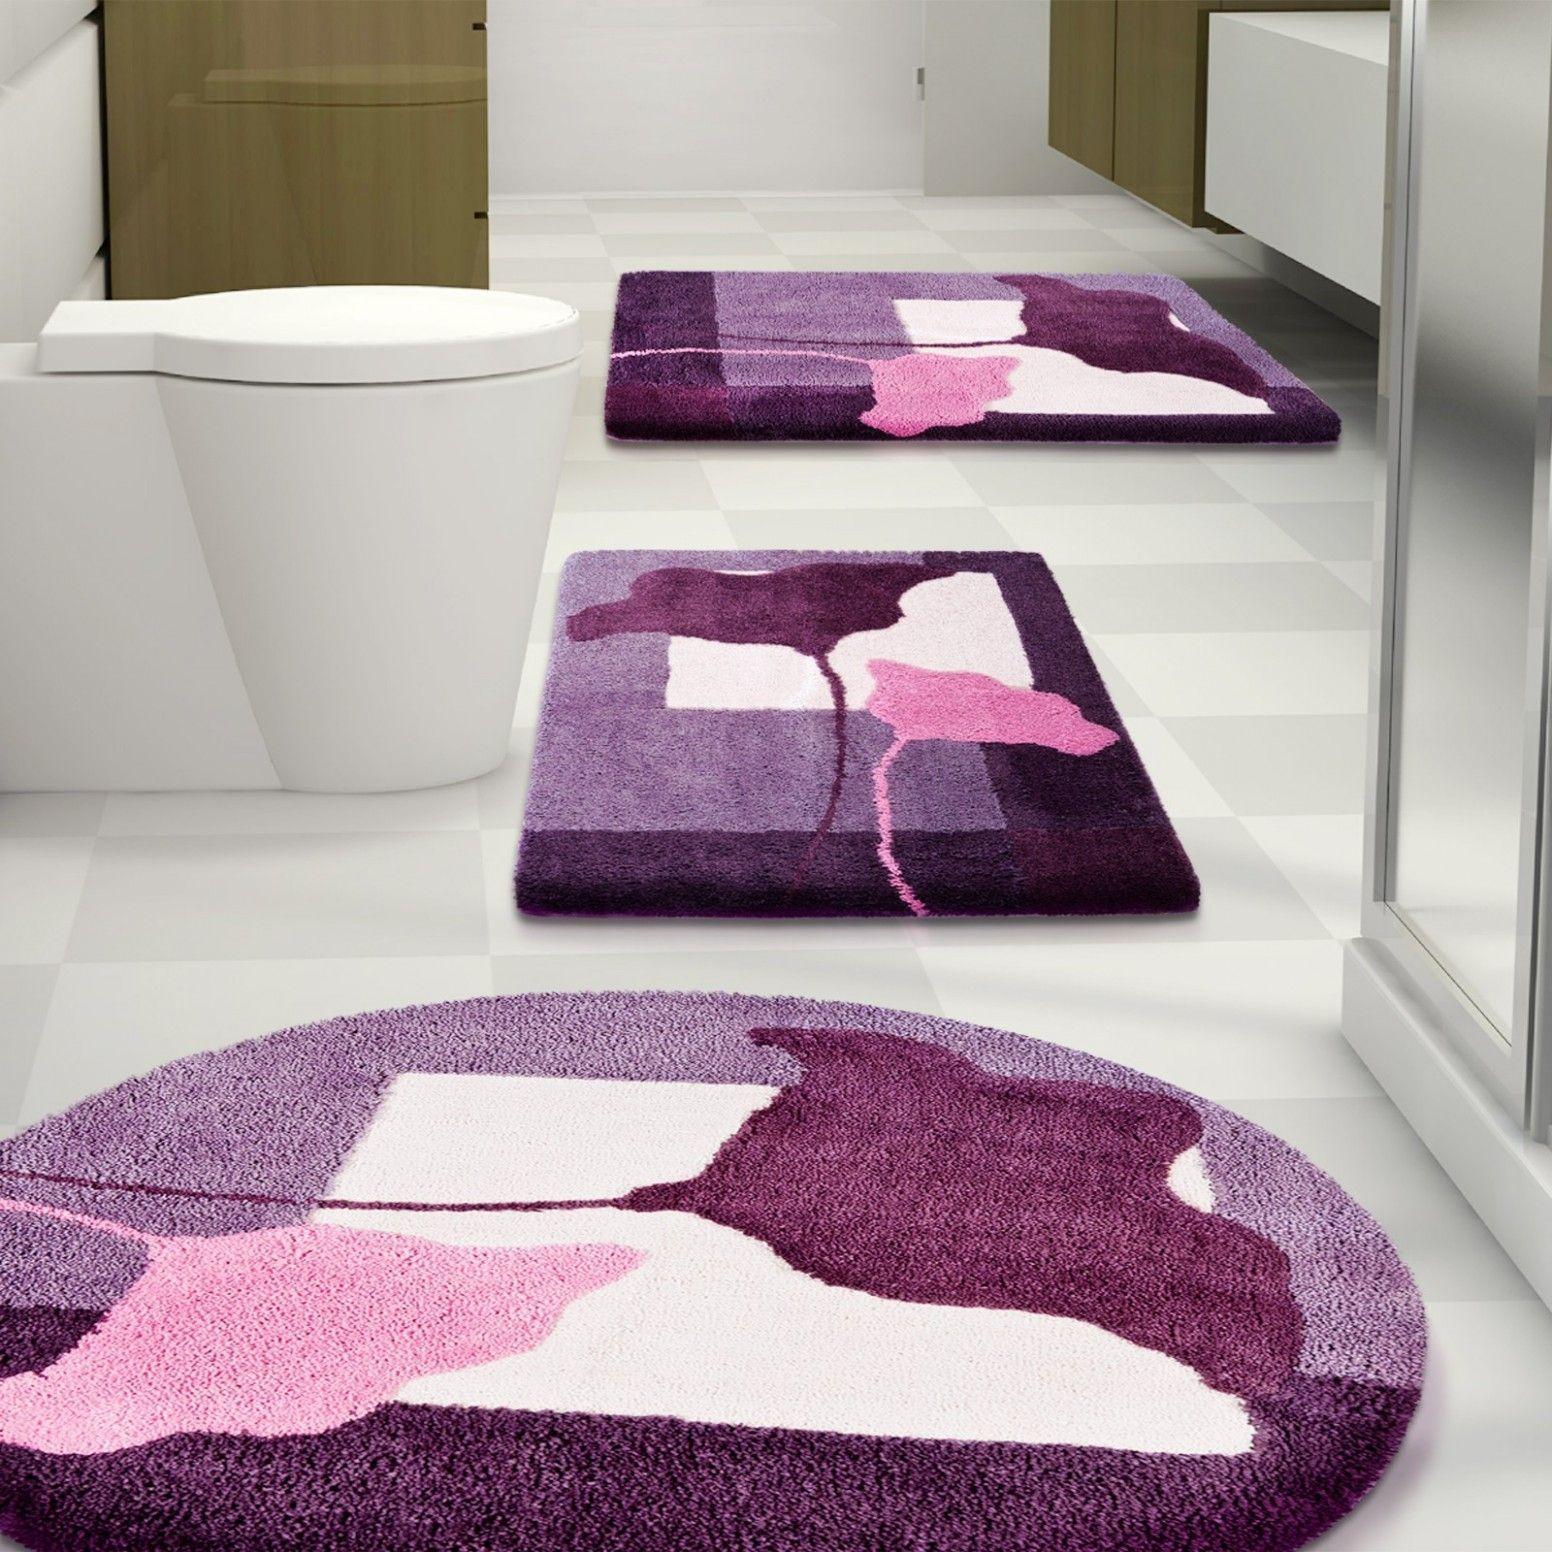 Bathroom Rug Sets Target Newest Rug Collections Bathroom Rug Sets Purple Bathrooms Gray Bathroom Accessories